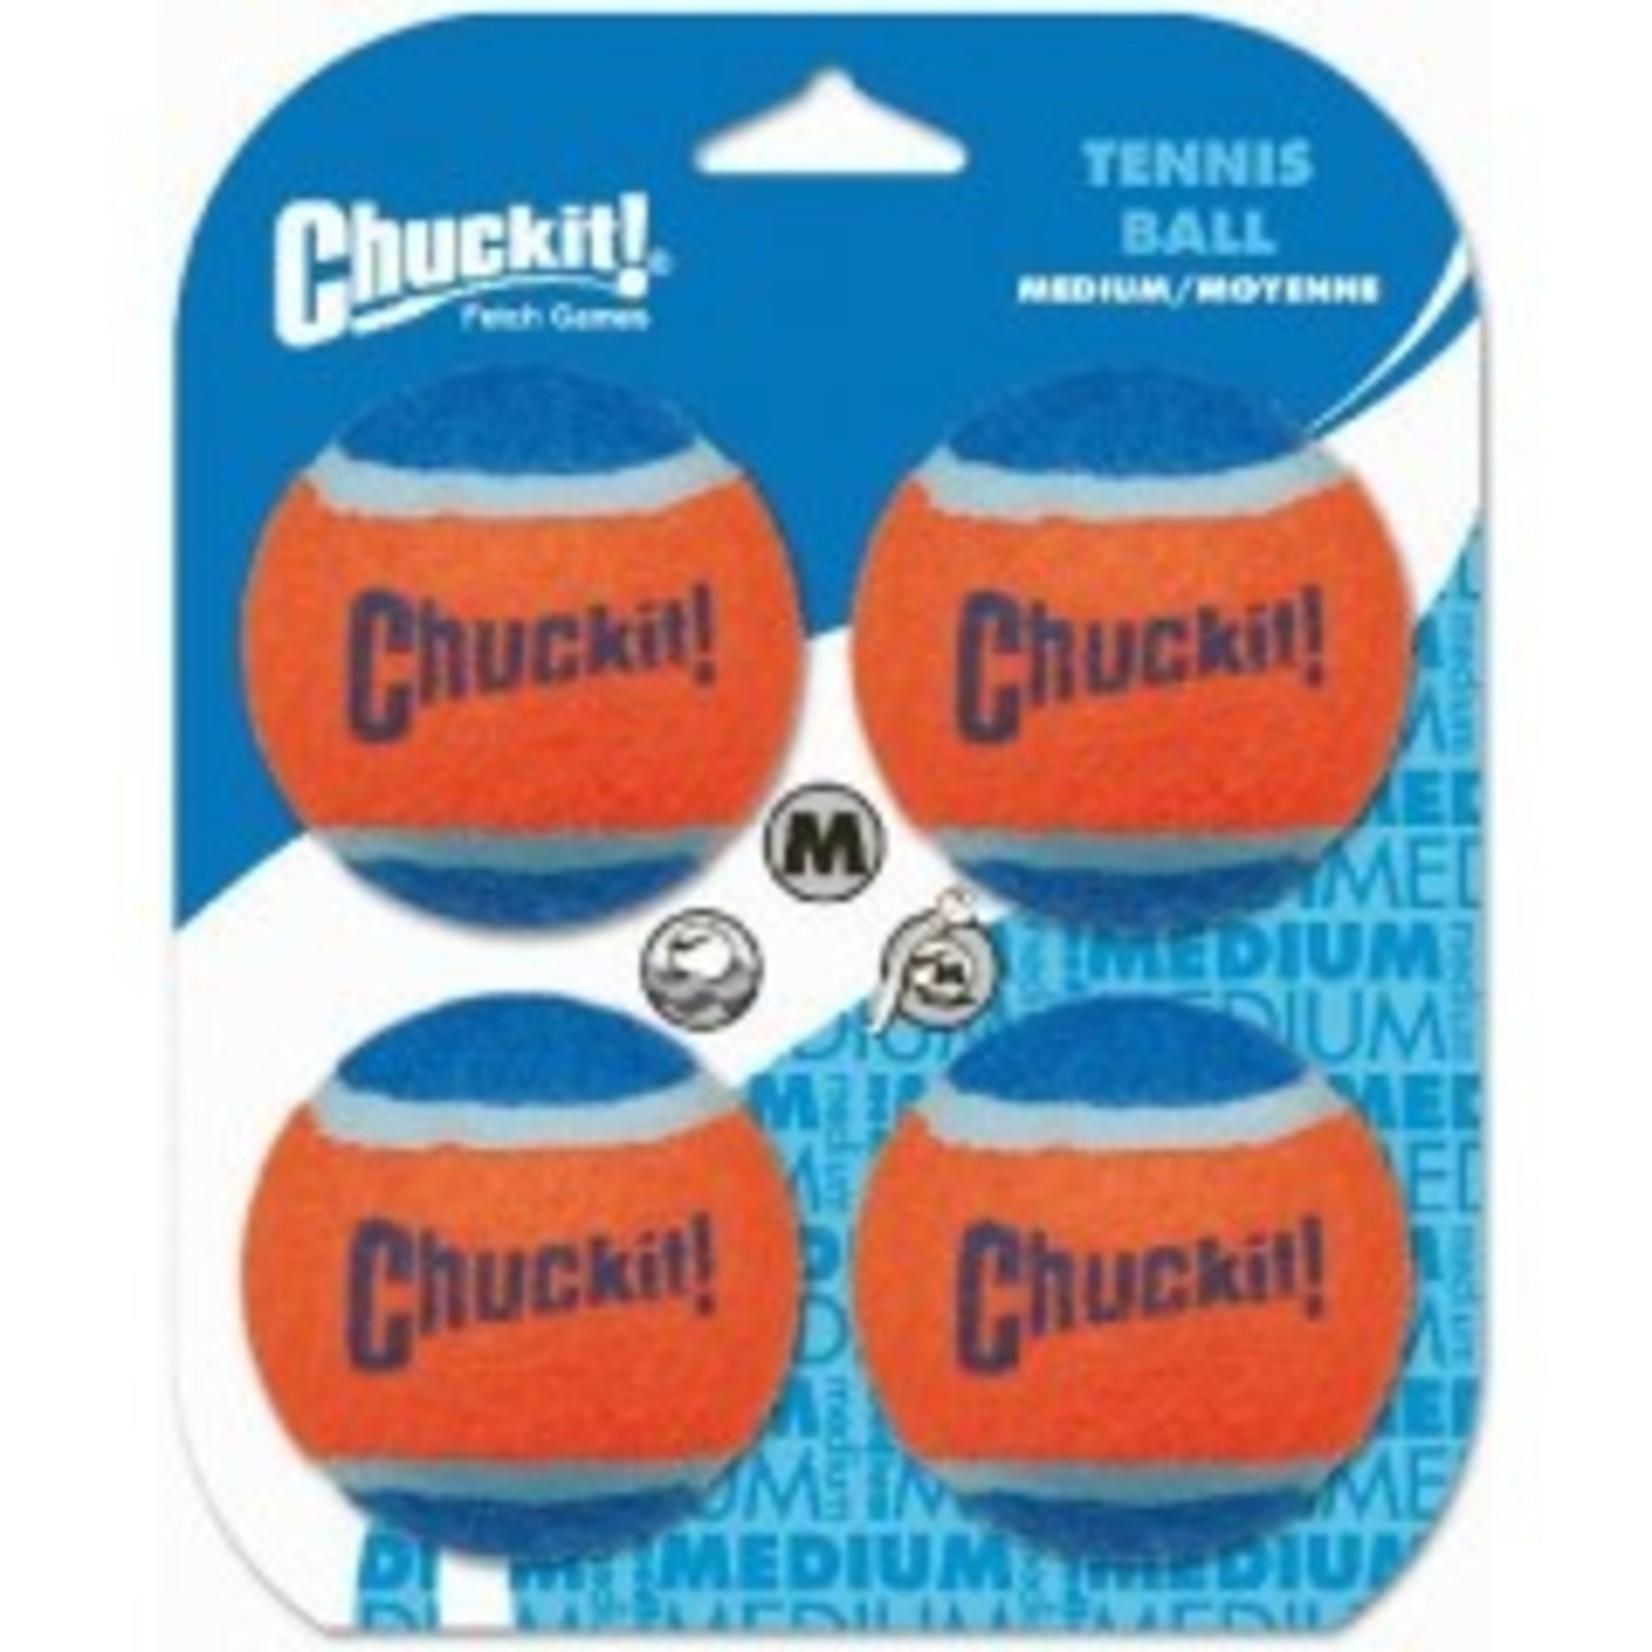 Chuckit Chuckit Tennisball medium. 4 pack